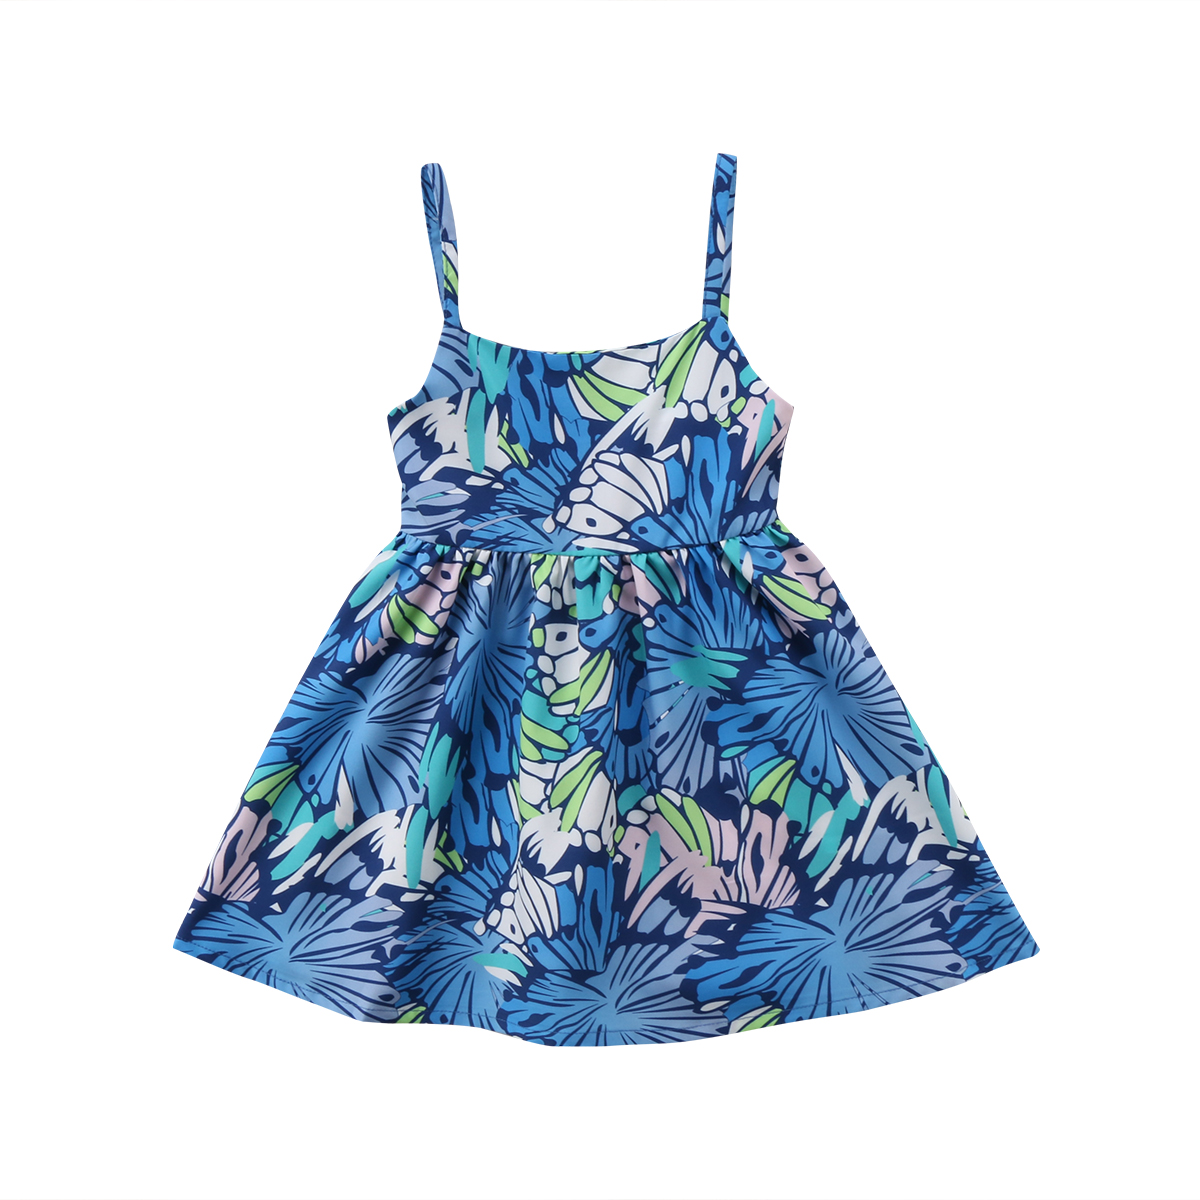 Fashion Princess Toddler Kids Baby Girls Strap Tunic Floral Dress Back Hollow Mini Sundress 0-5T